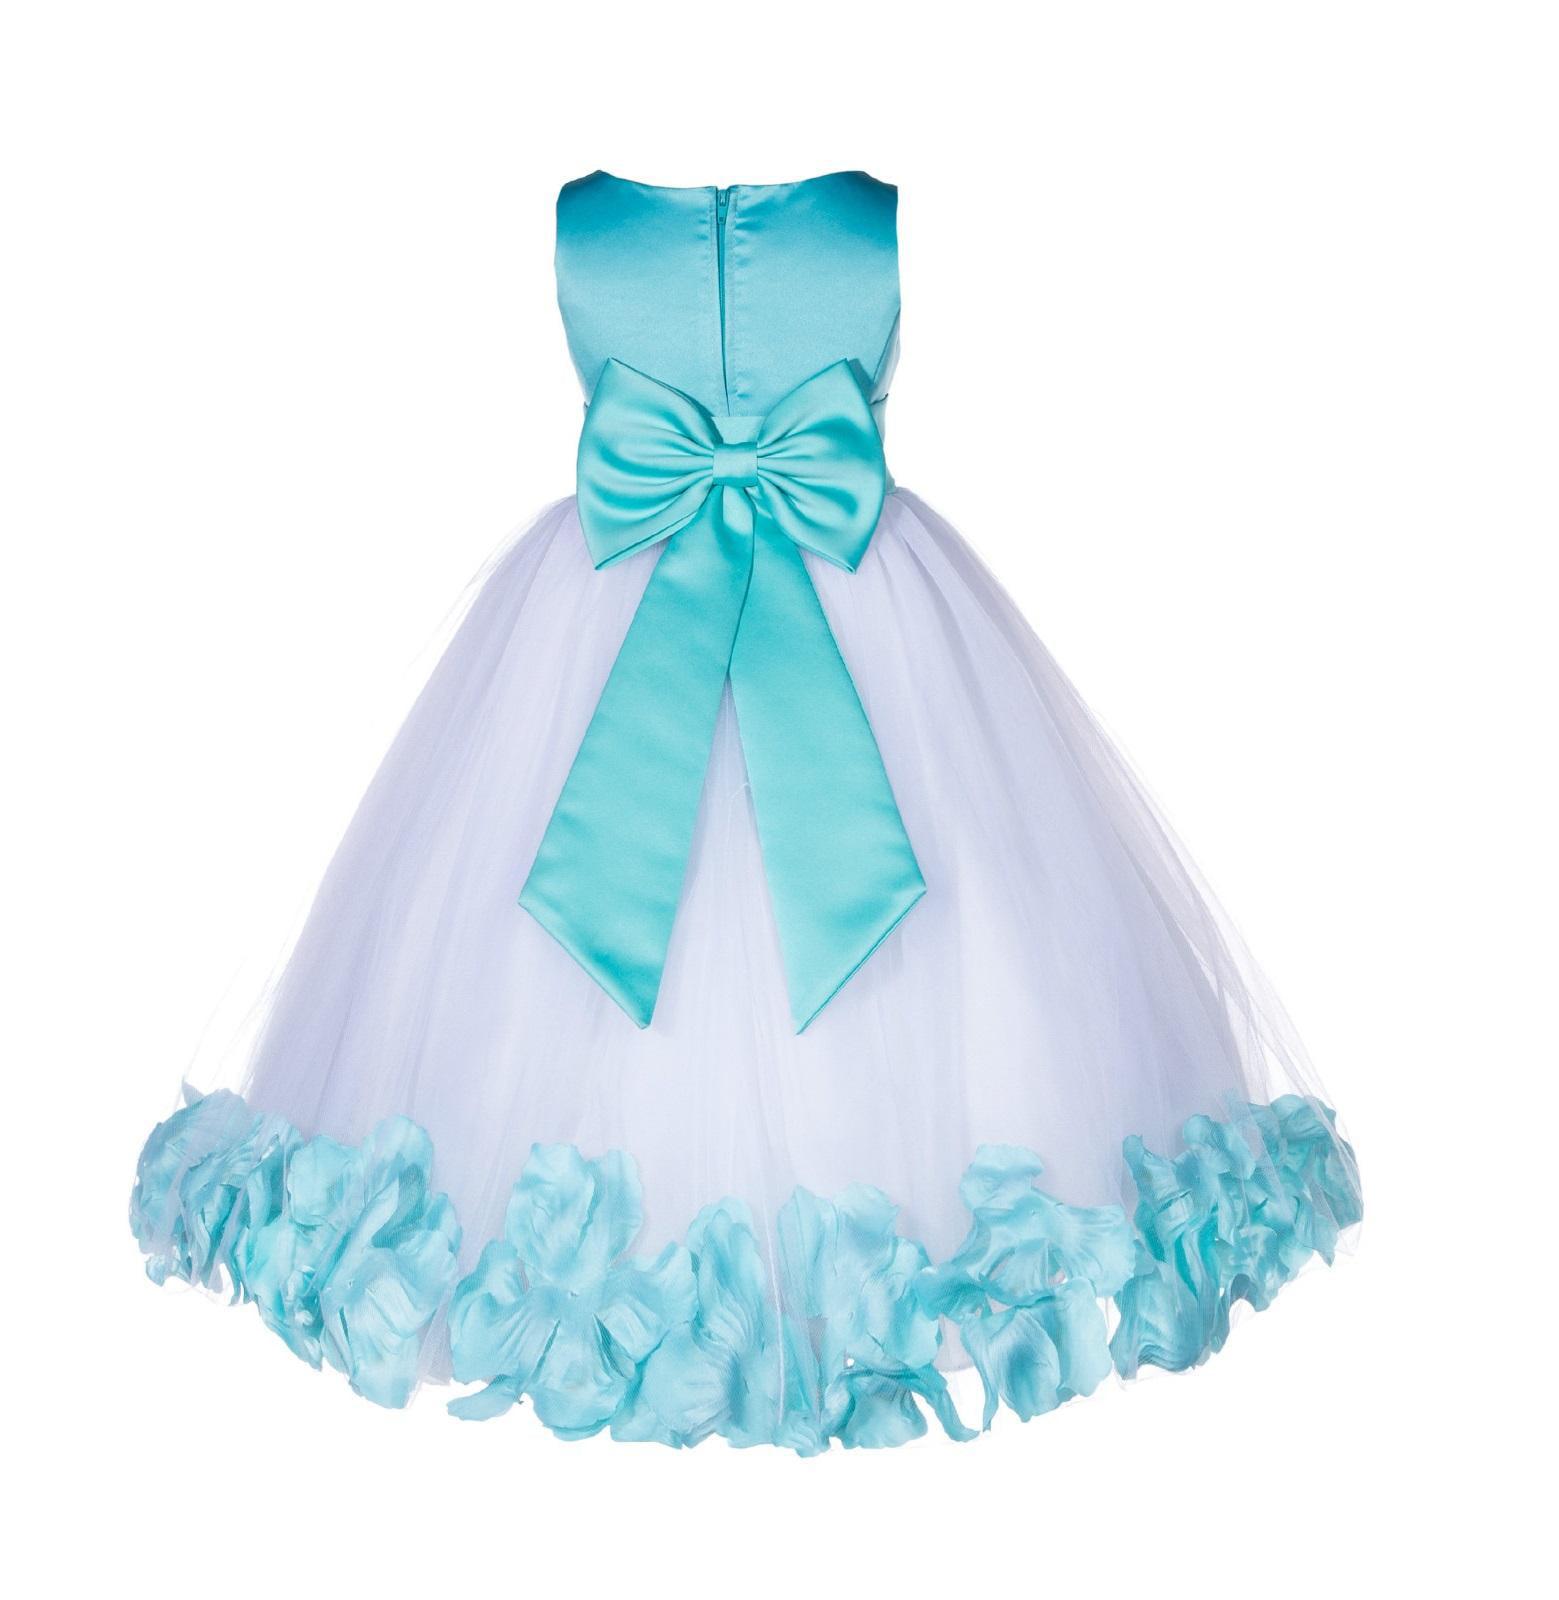 Ekidsbridal Rose Petals Tulle Flower Girl Dress Wedding Pageant ...